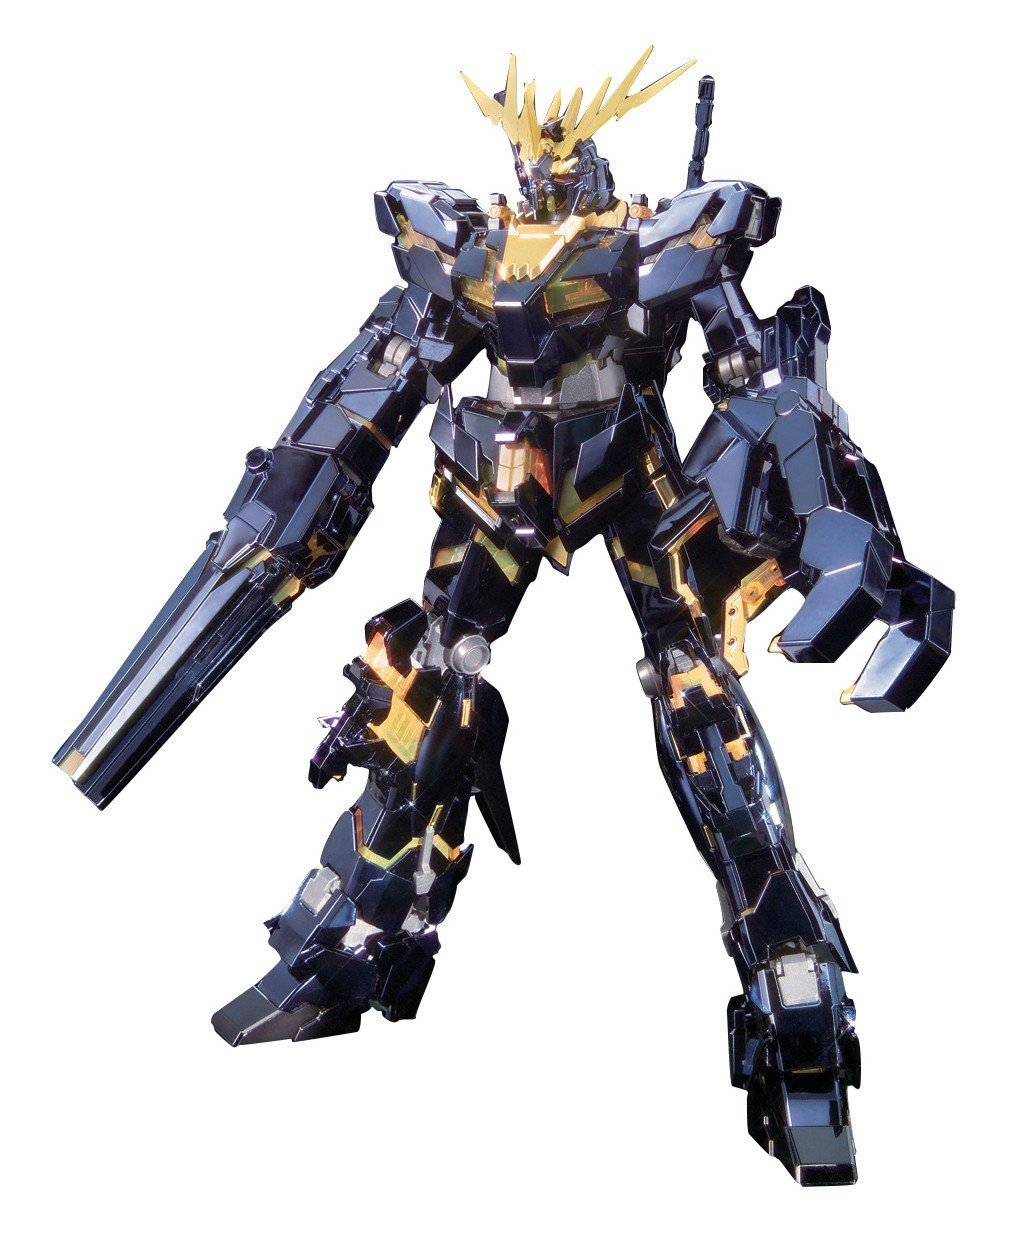 Bandai Hobby Banshee Titanium Finish Master Grade 1/100 RX-0 Gundam Unicorn Unit 02 Action Figure [並行輸入品] B00YFU2KJA